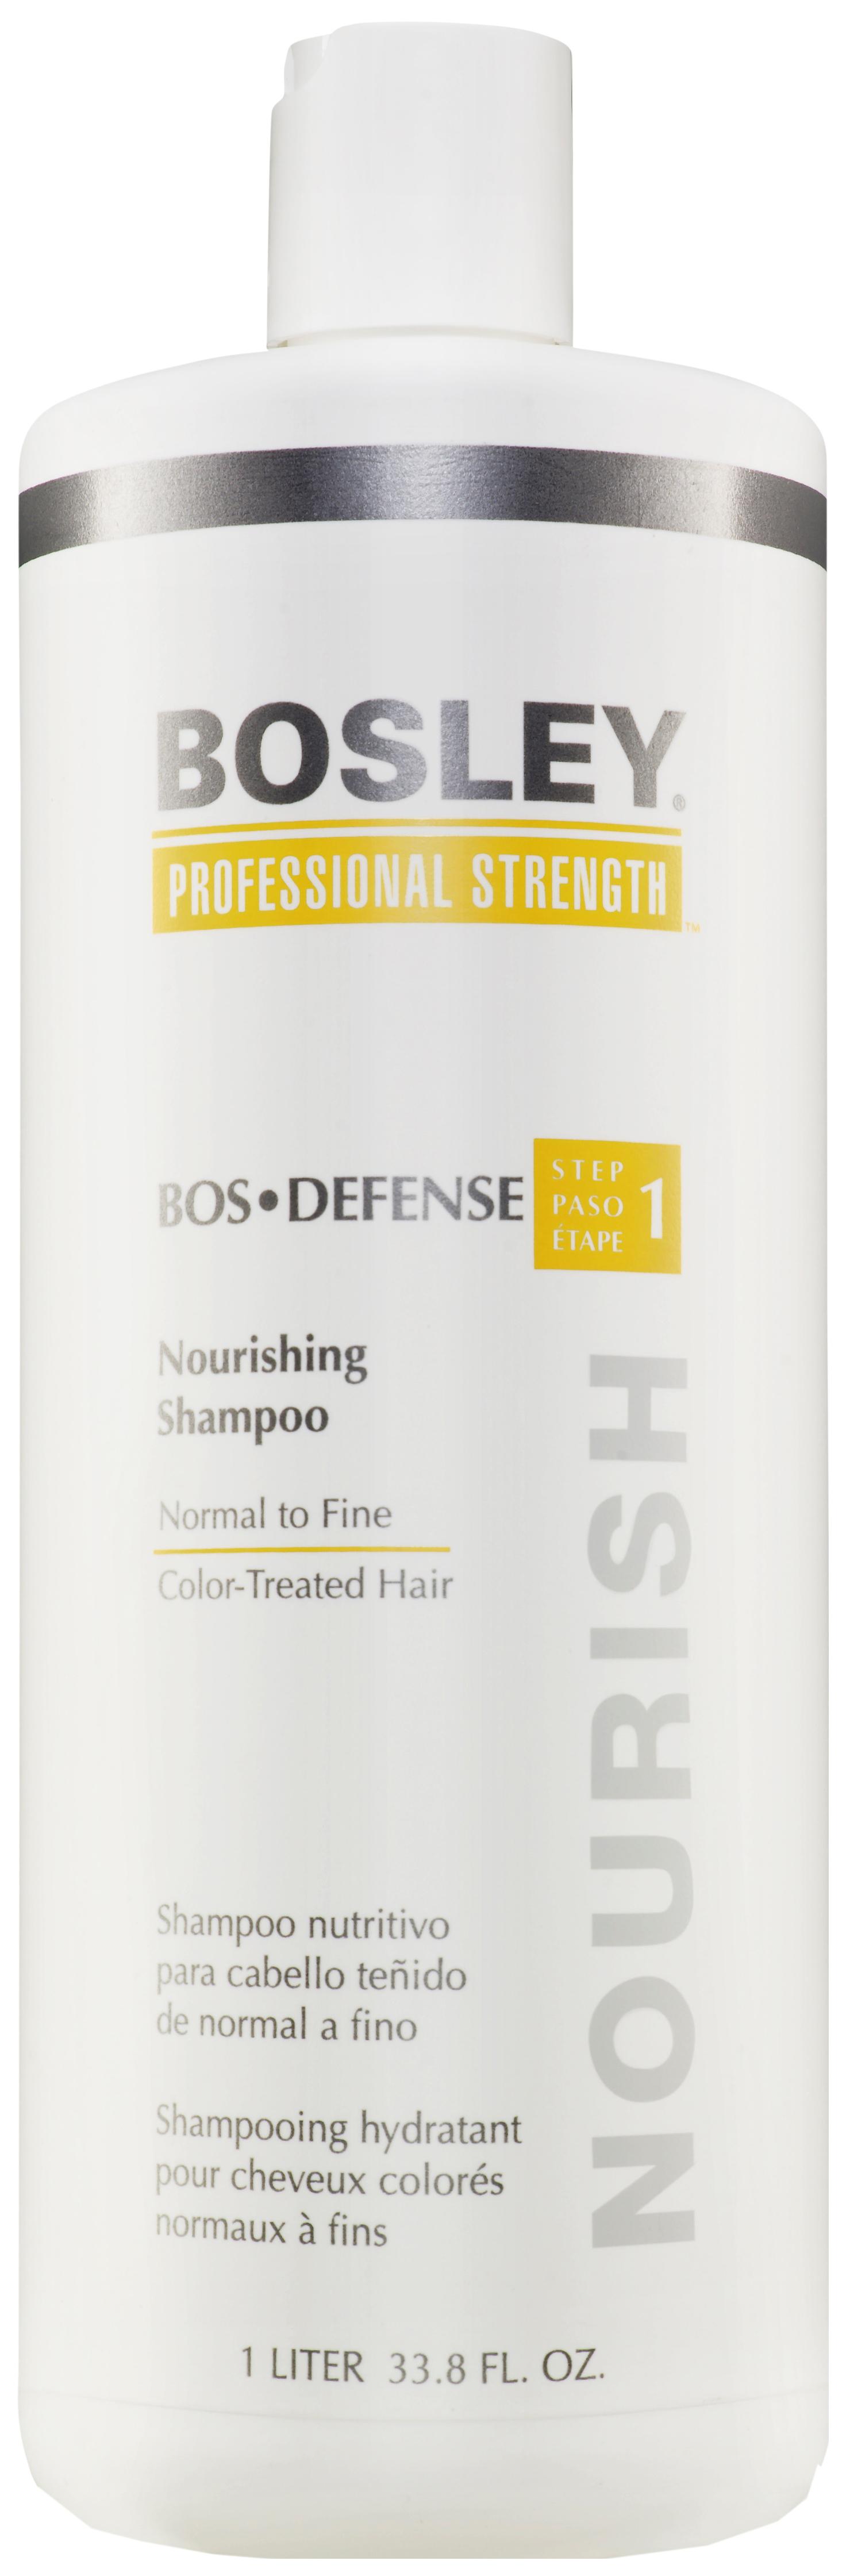 Купить Шампунь Bosley Вos Defense Nourishing Shampoo Normal to Fine Color-Treated Hair Step 1 1 л